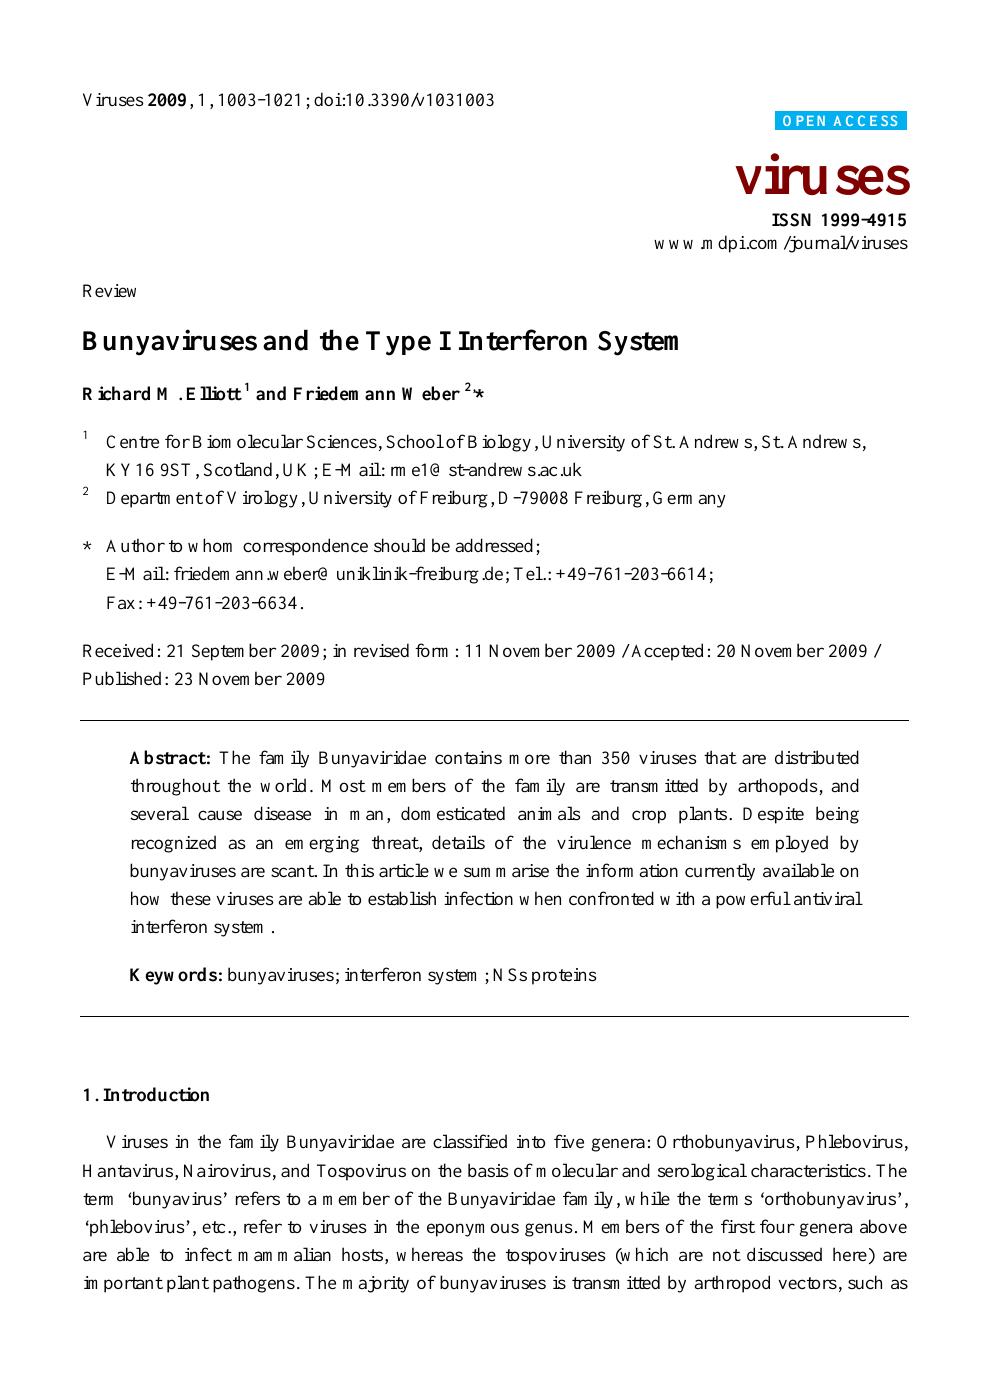 Bunyaviruses and the Type I Interferon System – topic of